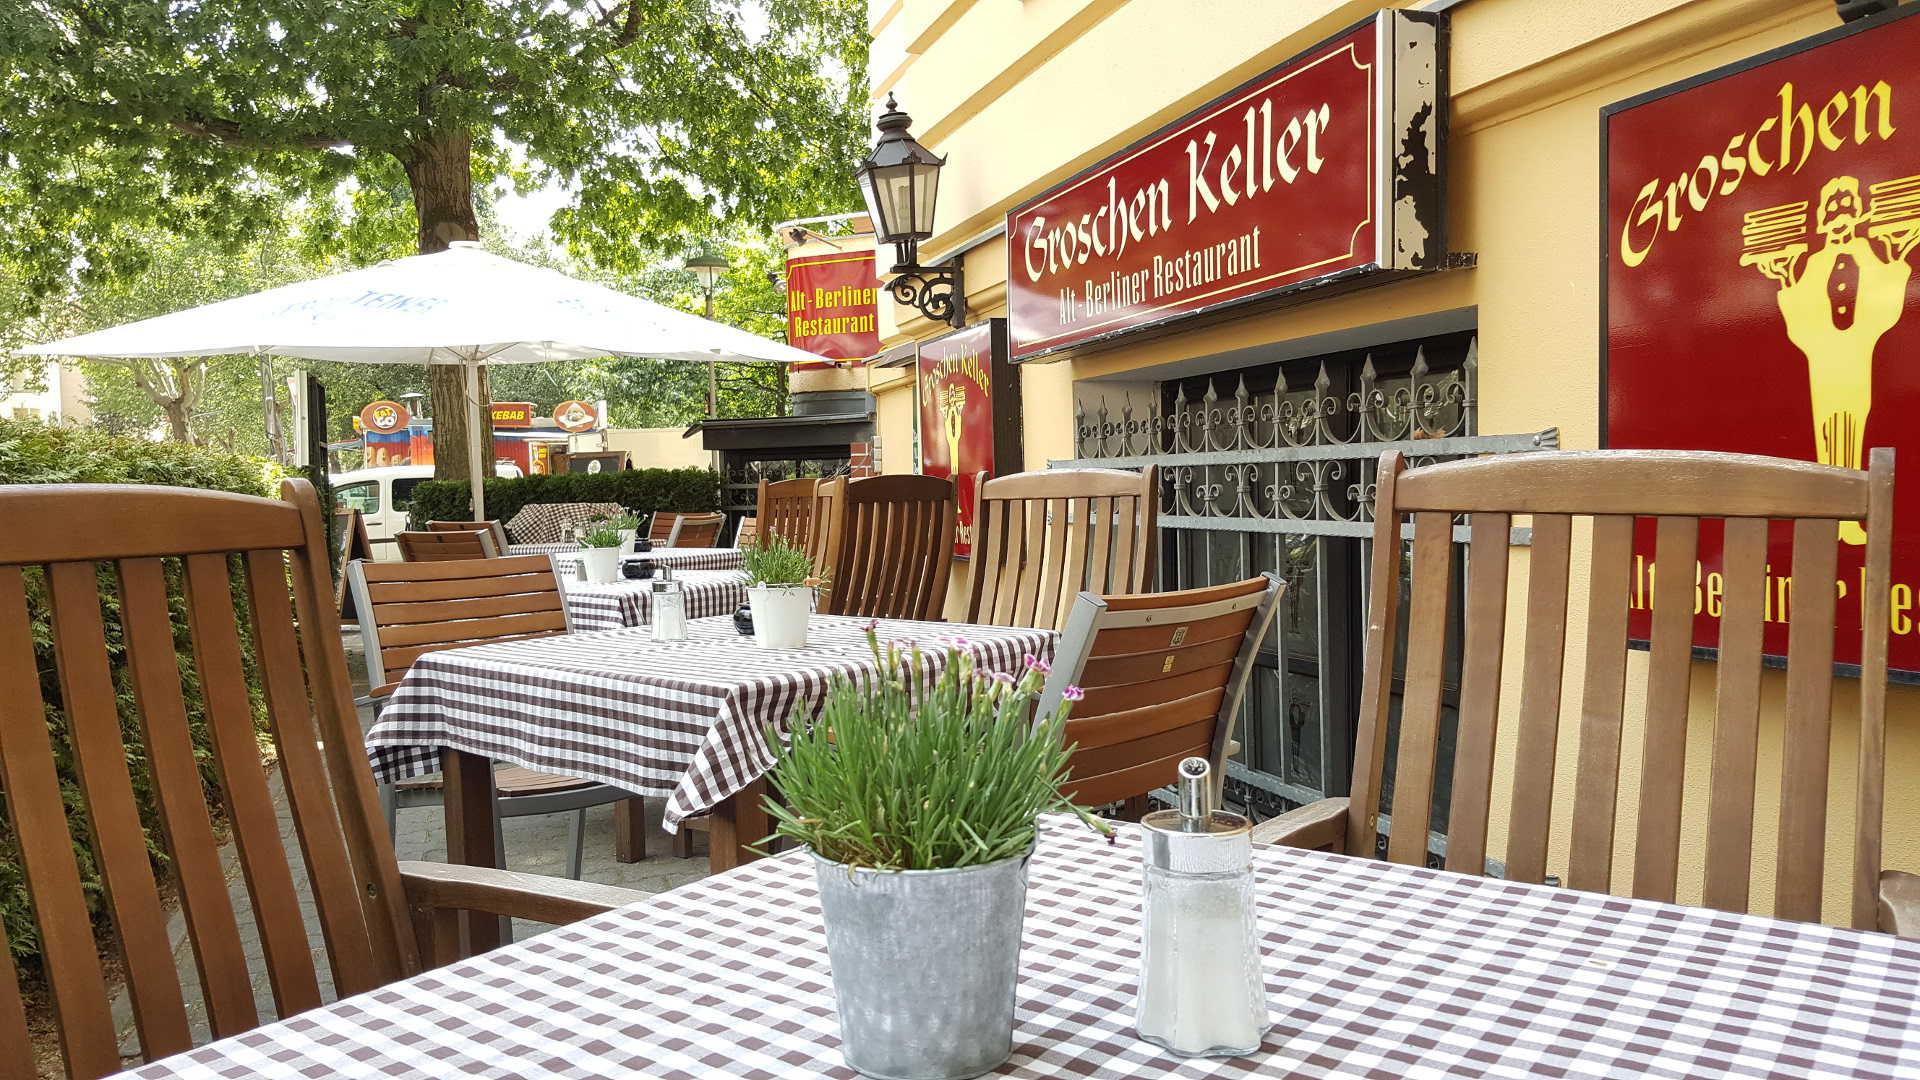 Groschenkeller_a2